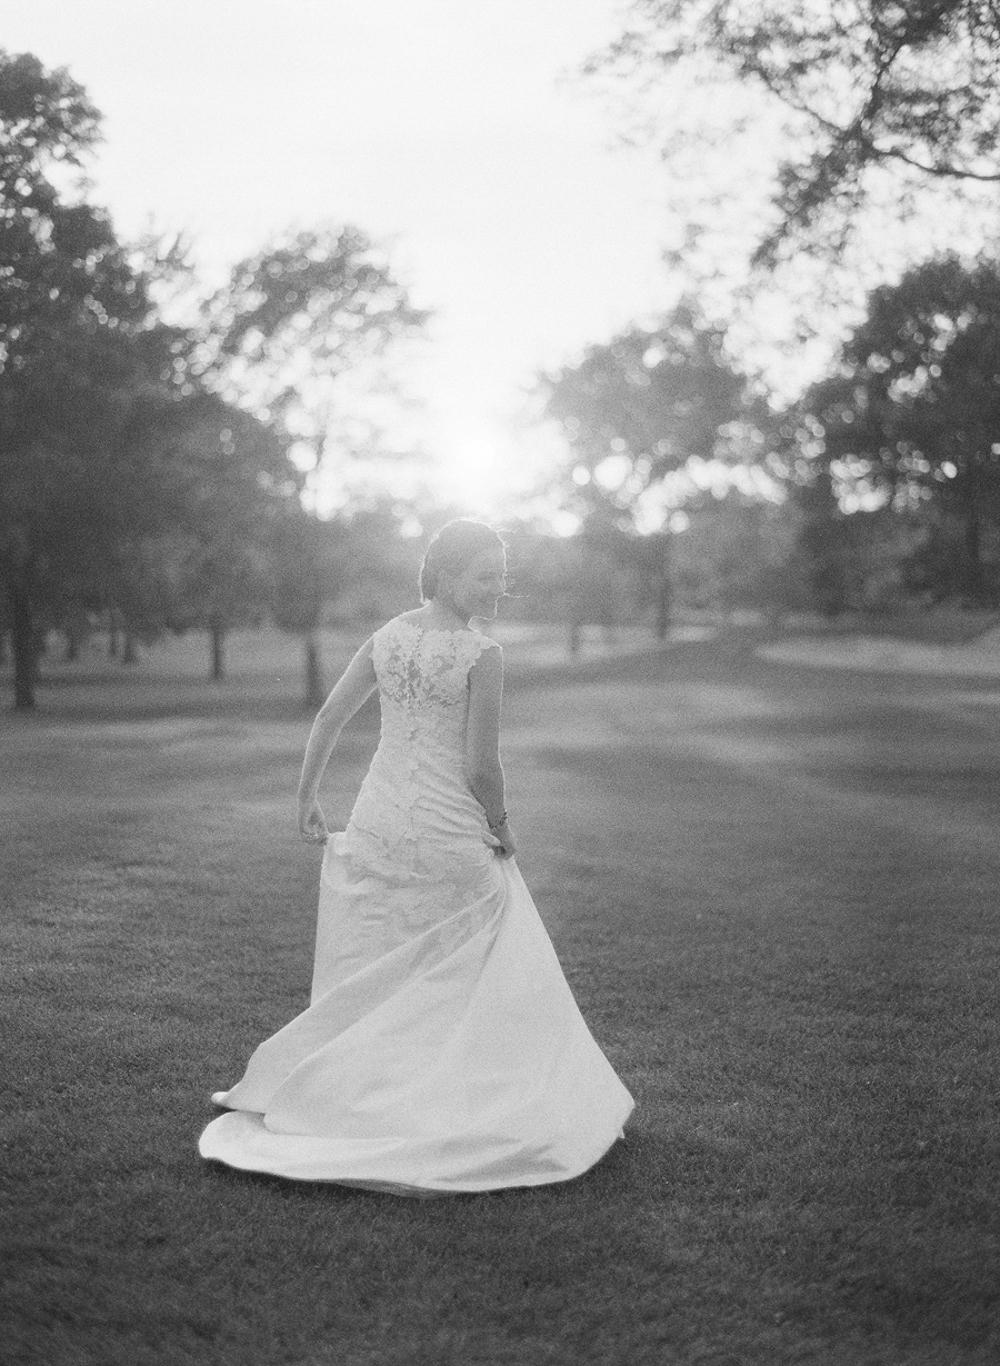 Glen_View_Club_Chicago_wedding_048.jpg